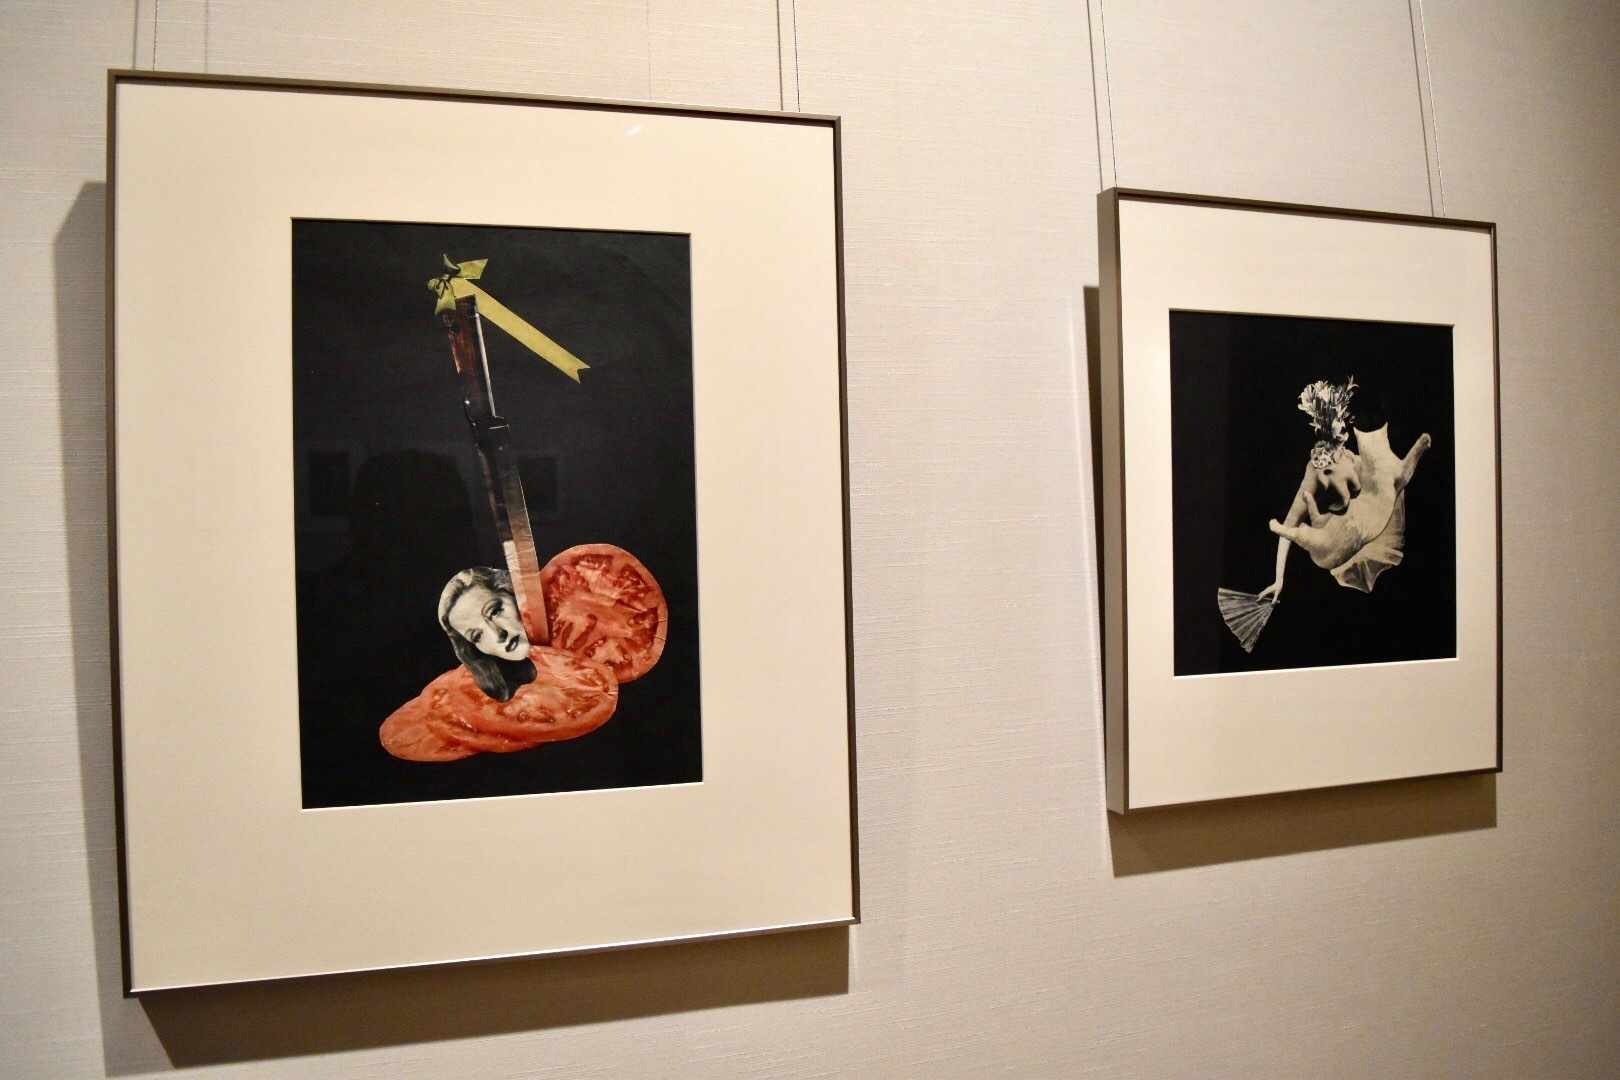 左:岡上淑子 《トマト》(旧題:作品A) 1951年 右奥:岡上淑子 《戯れ》 1952年